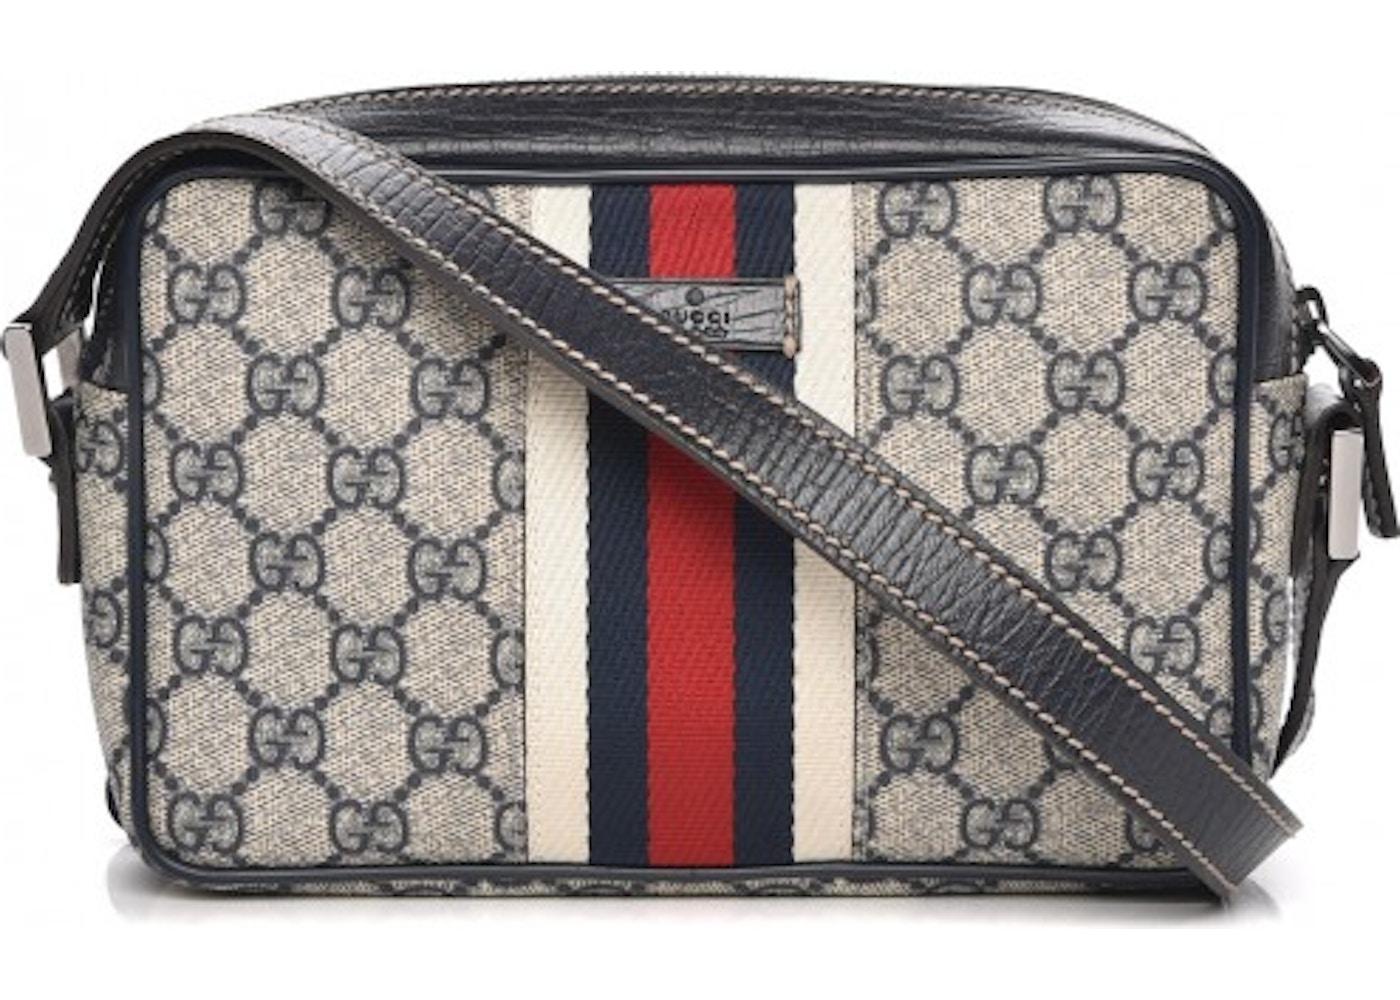 d32618633dc Gucci Vintage Web Shoulder Bag Monogram GG Small Navy Dark ...